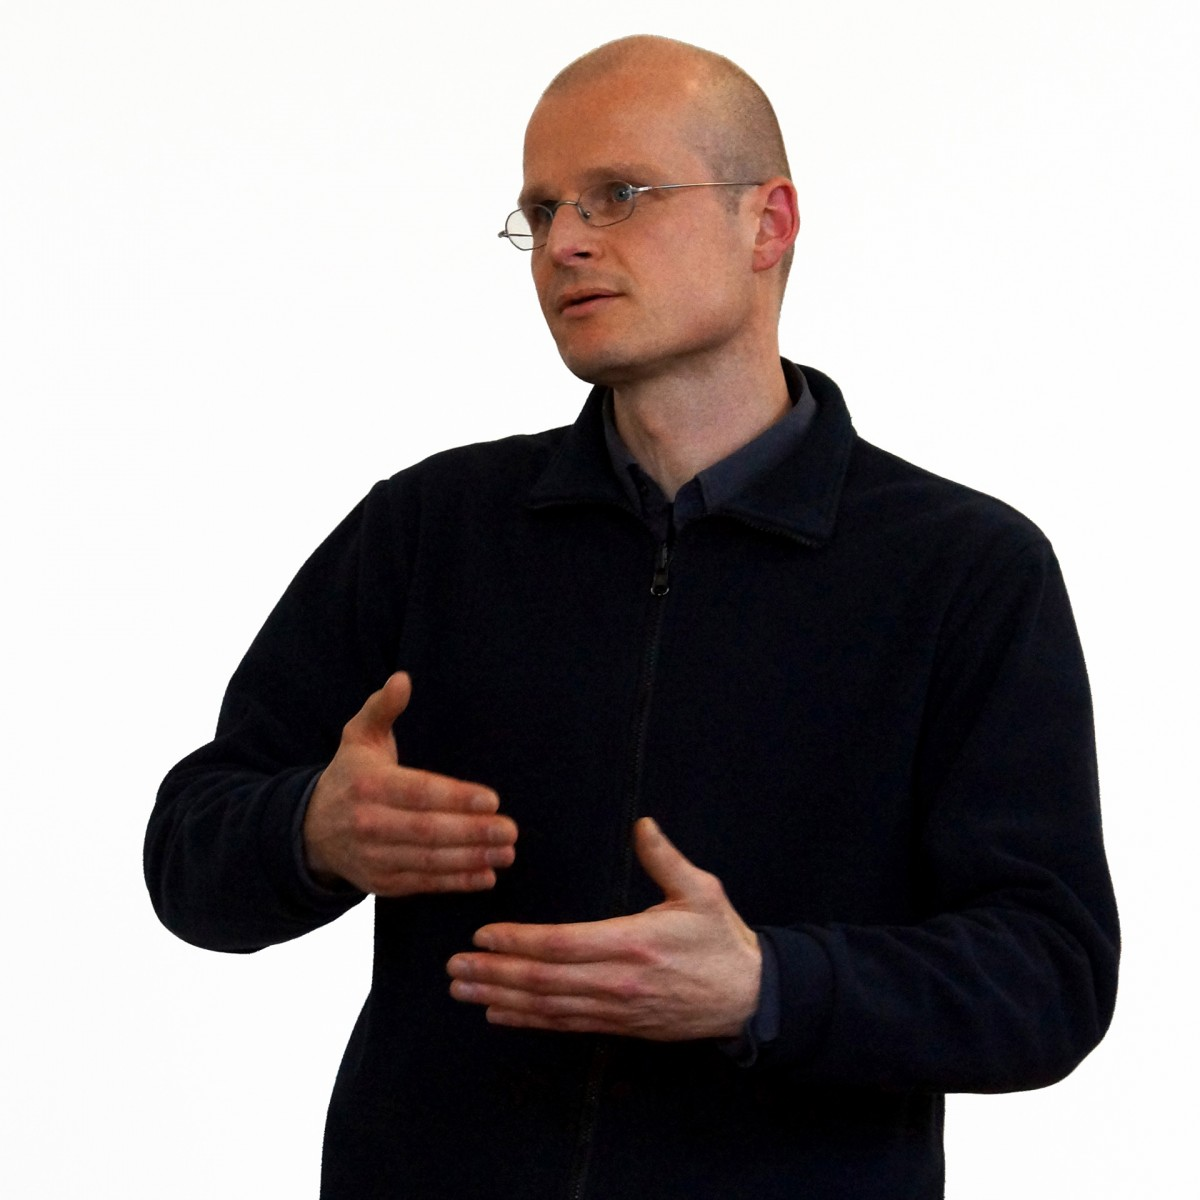 Jürgen Krause (Bild 9): Künstler im Gespräch – Kunsthaus Nürnberg (2015)